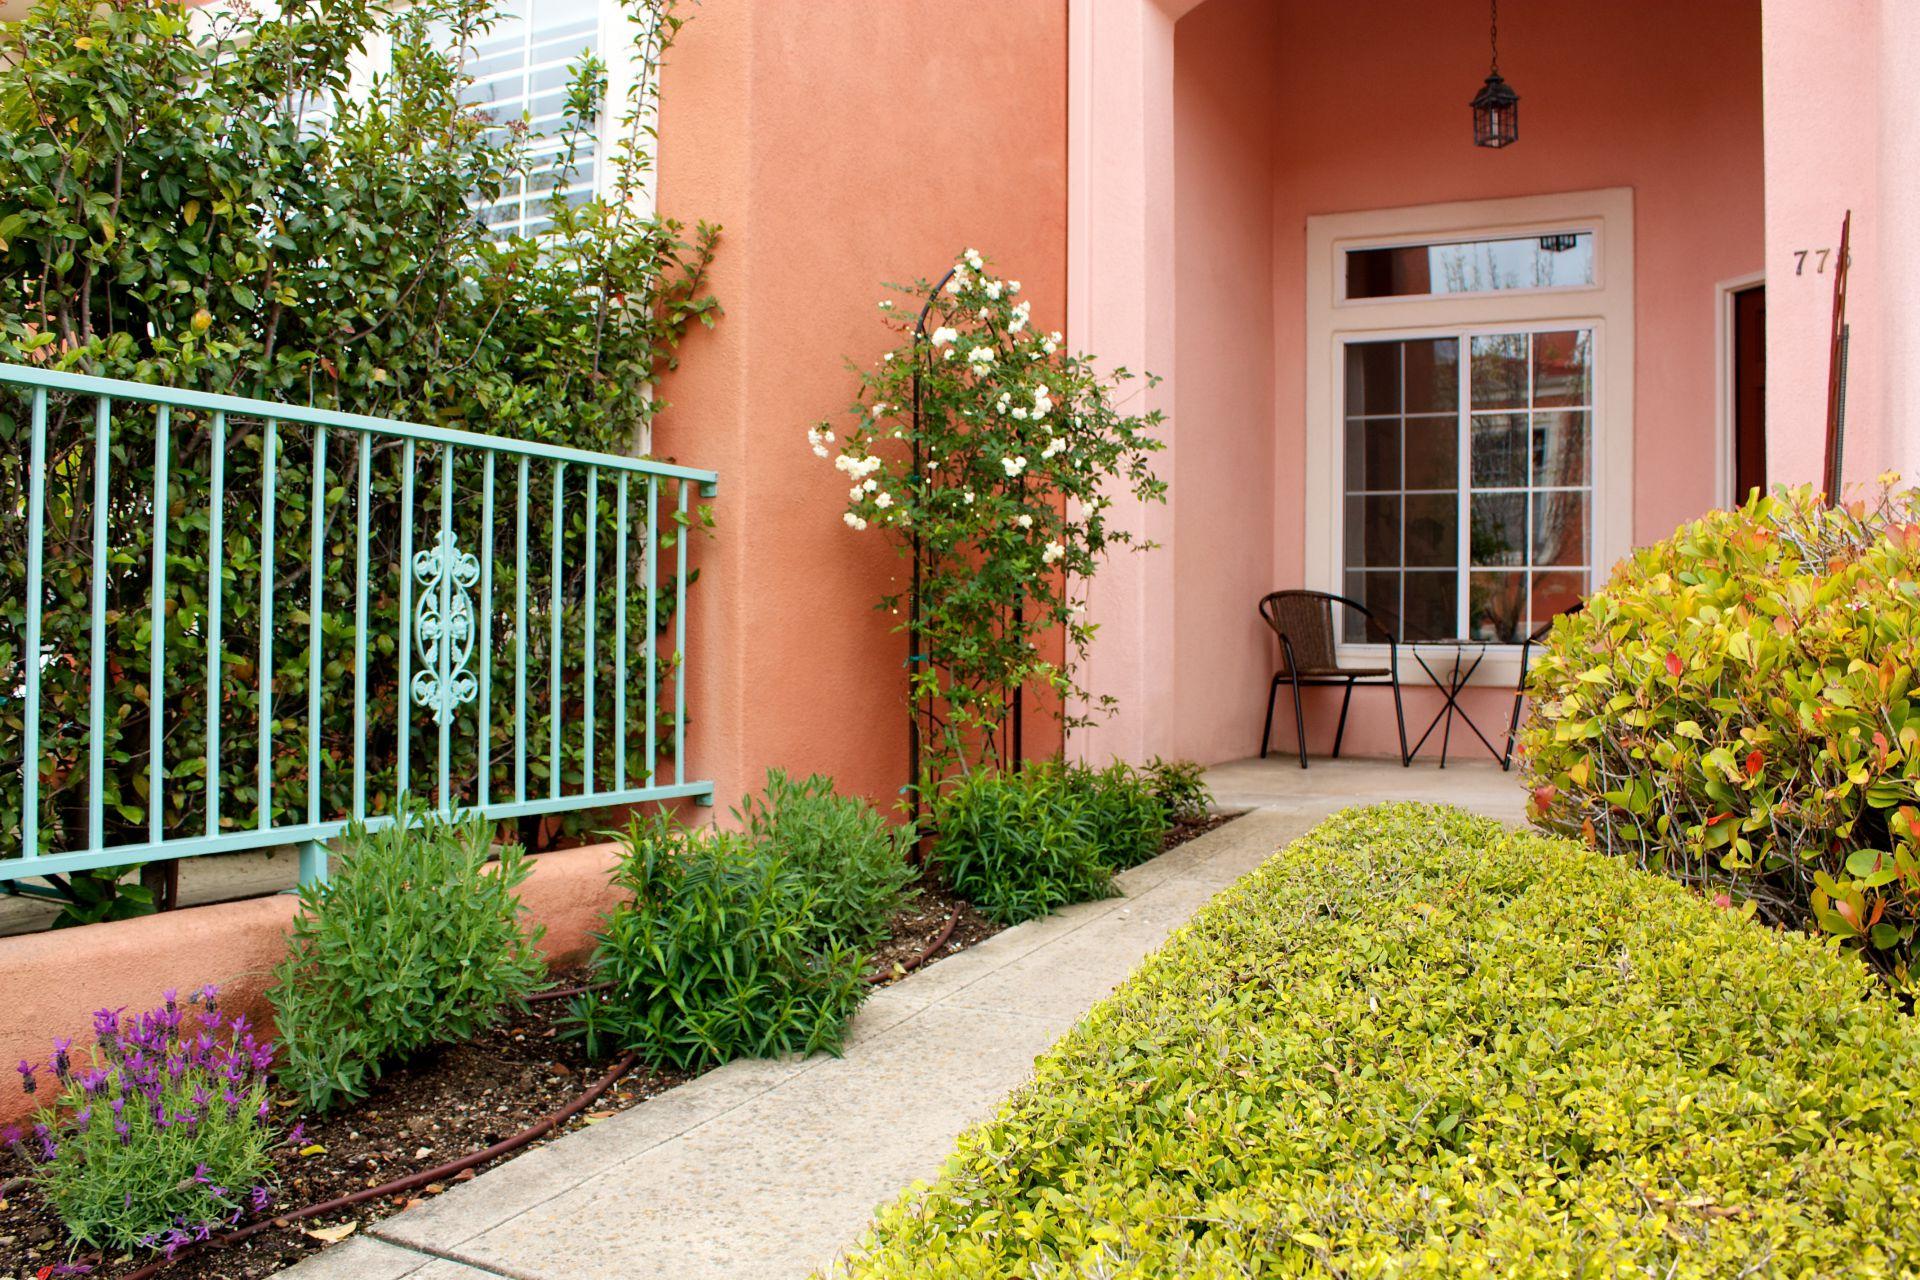 Two Bedroom Single Level Condo In San Luis Obispo California   Home Exchange